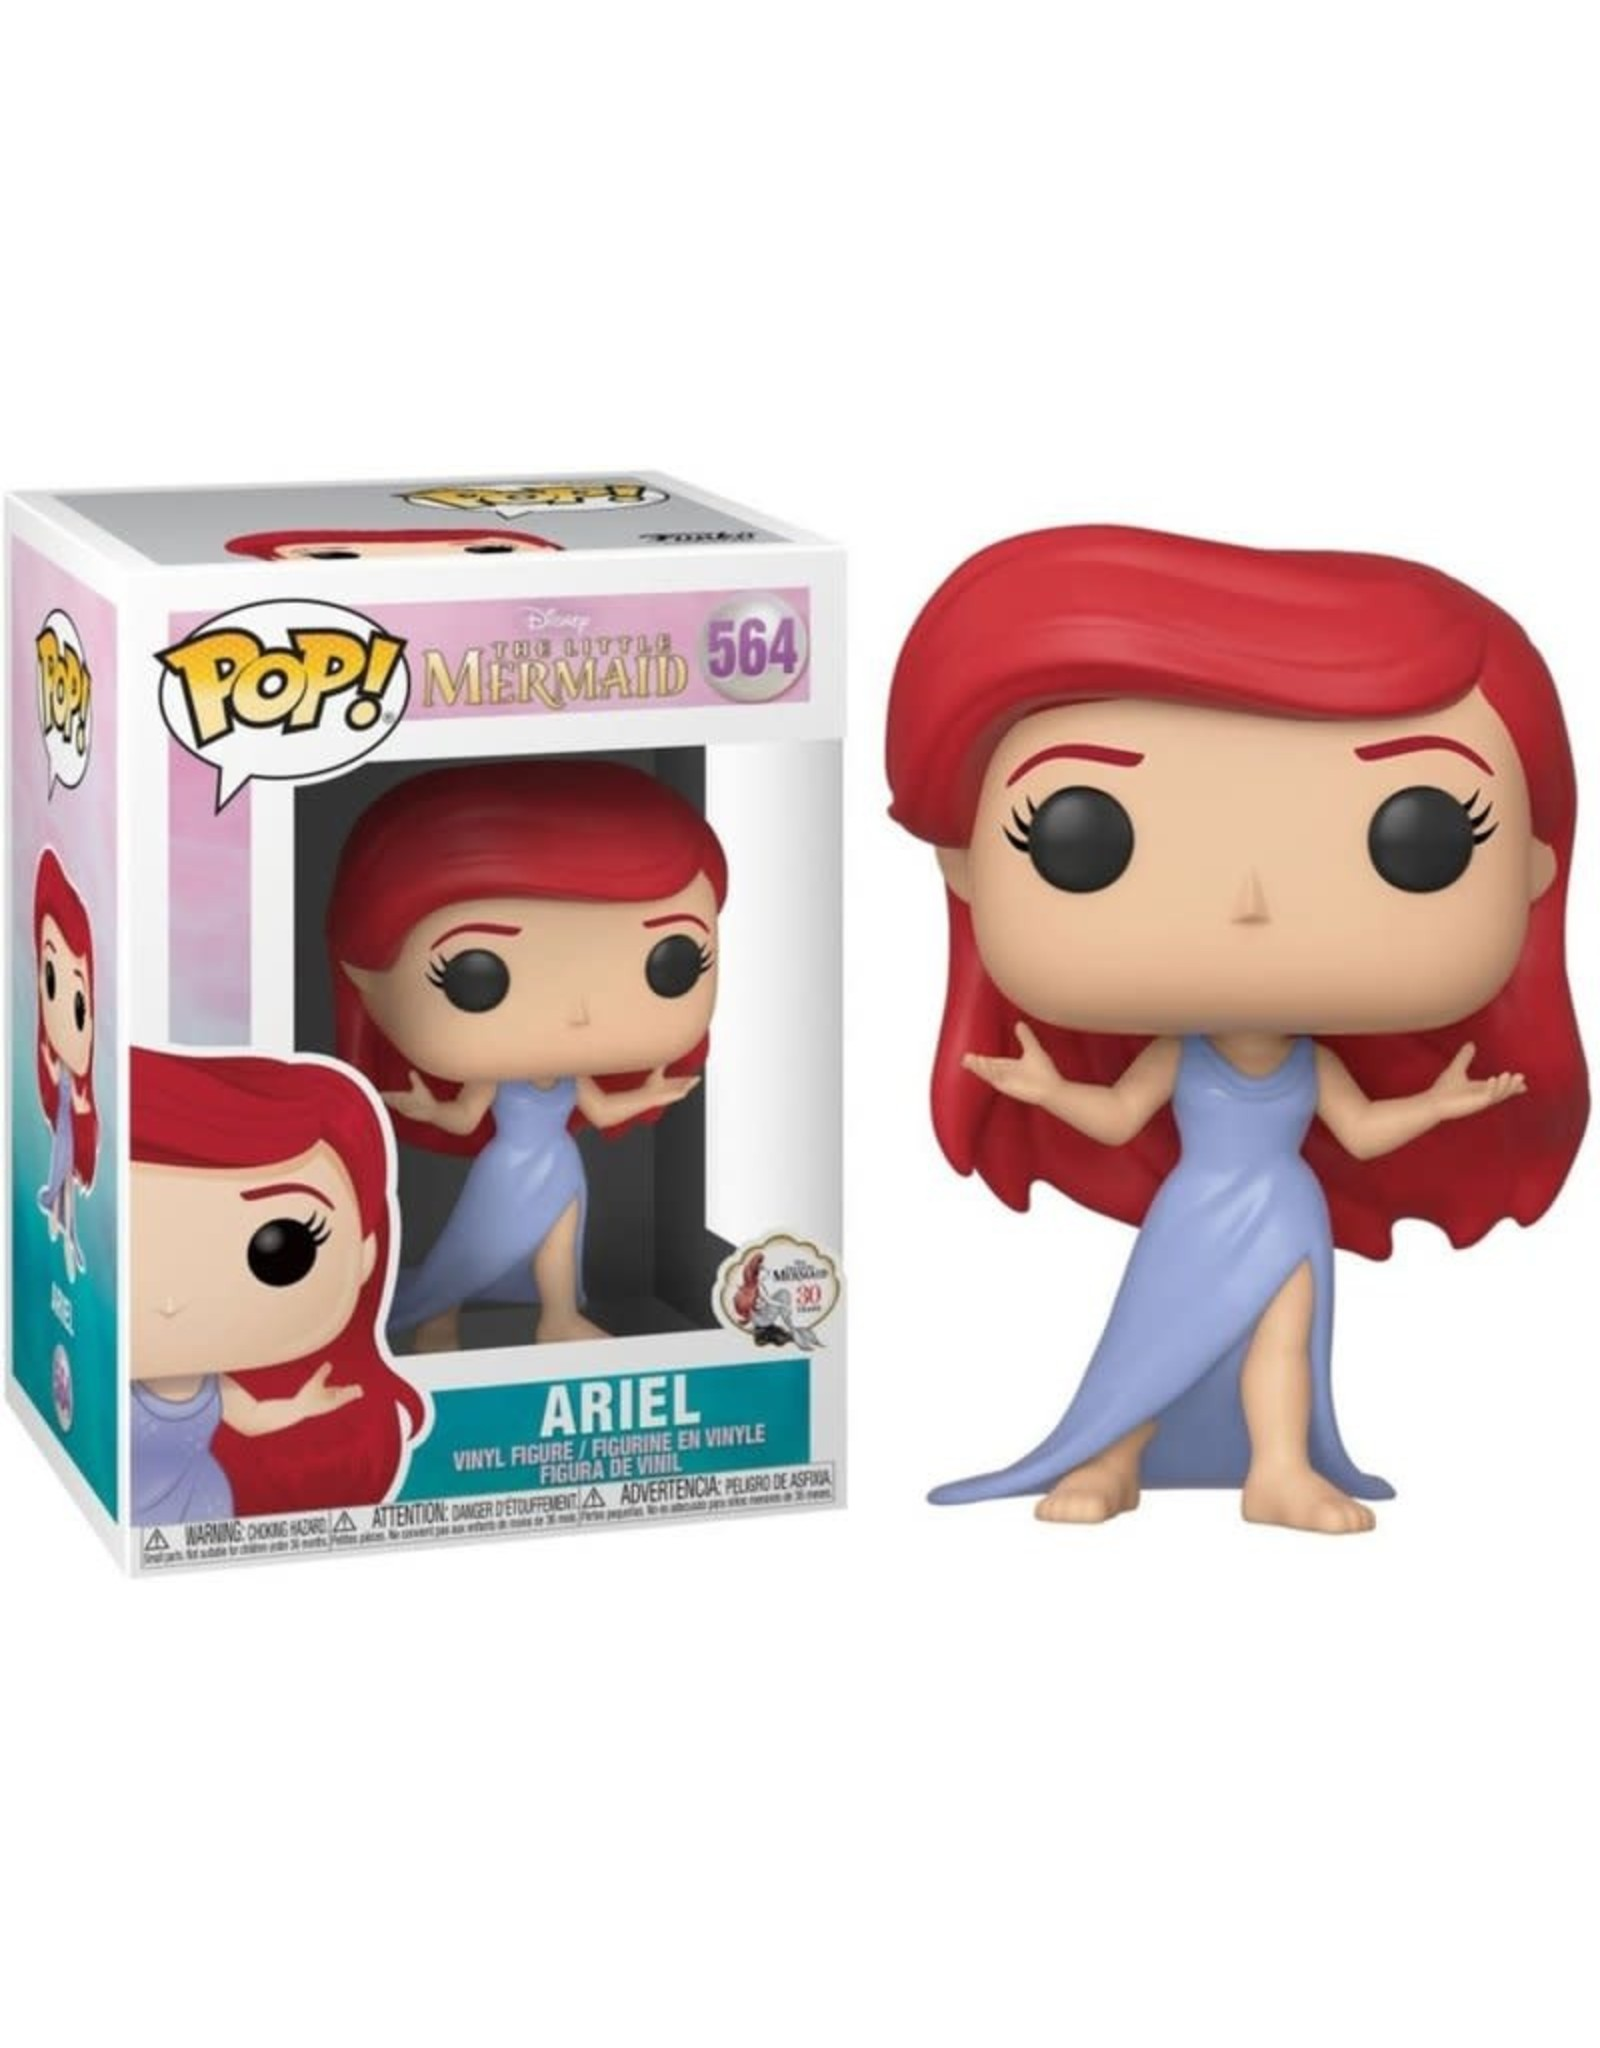 The Little Mermaid POP! Disney Vinyl Figure Ariel (Purple Dress) 9 cm